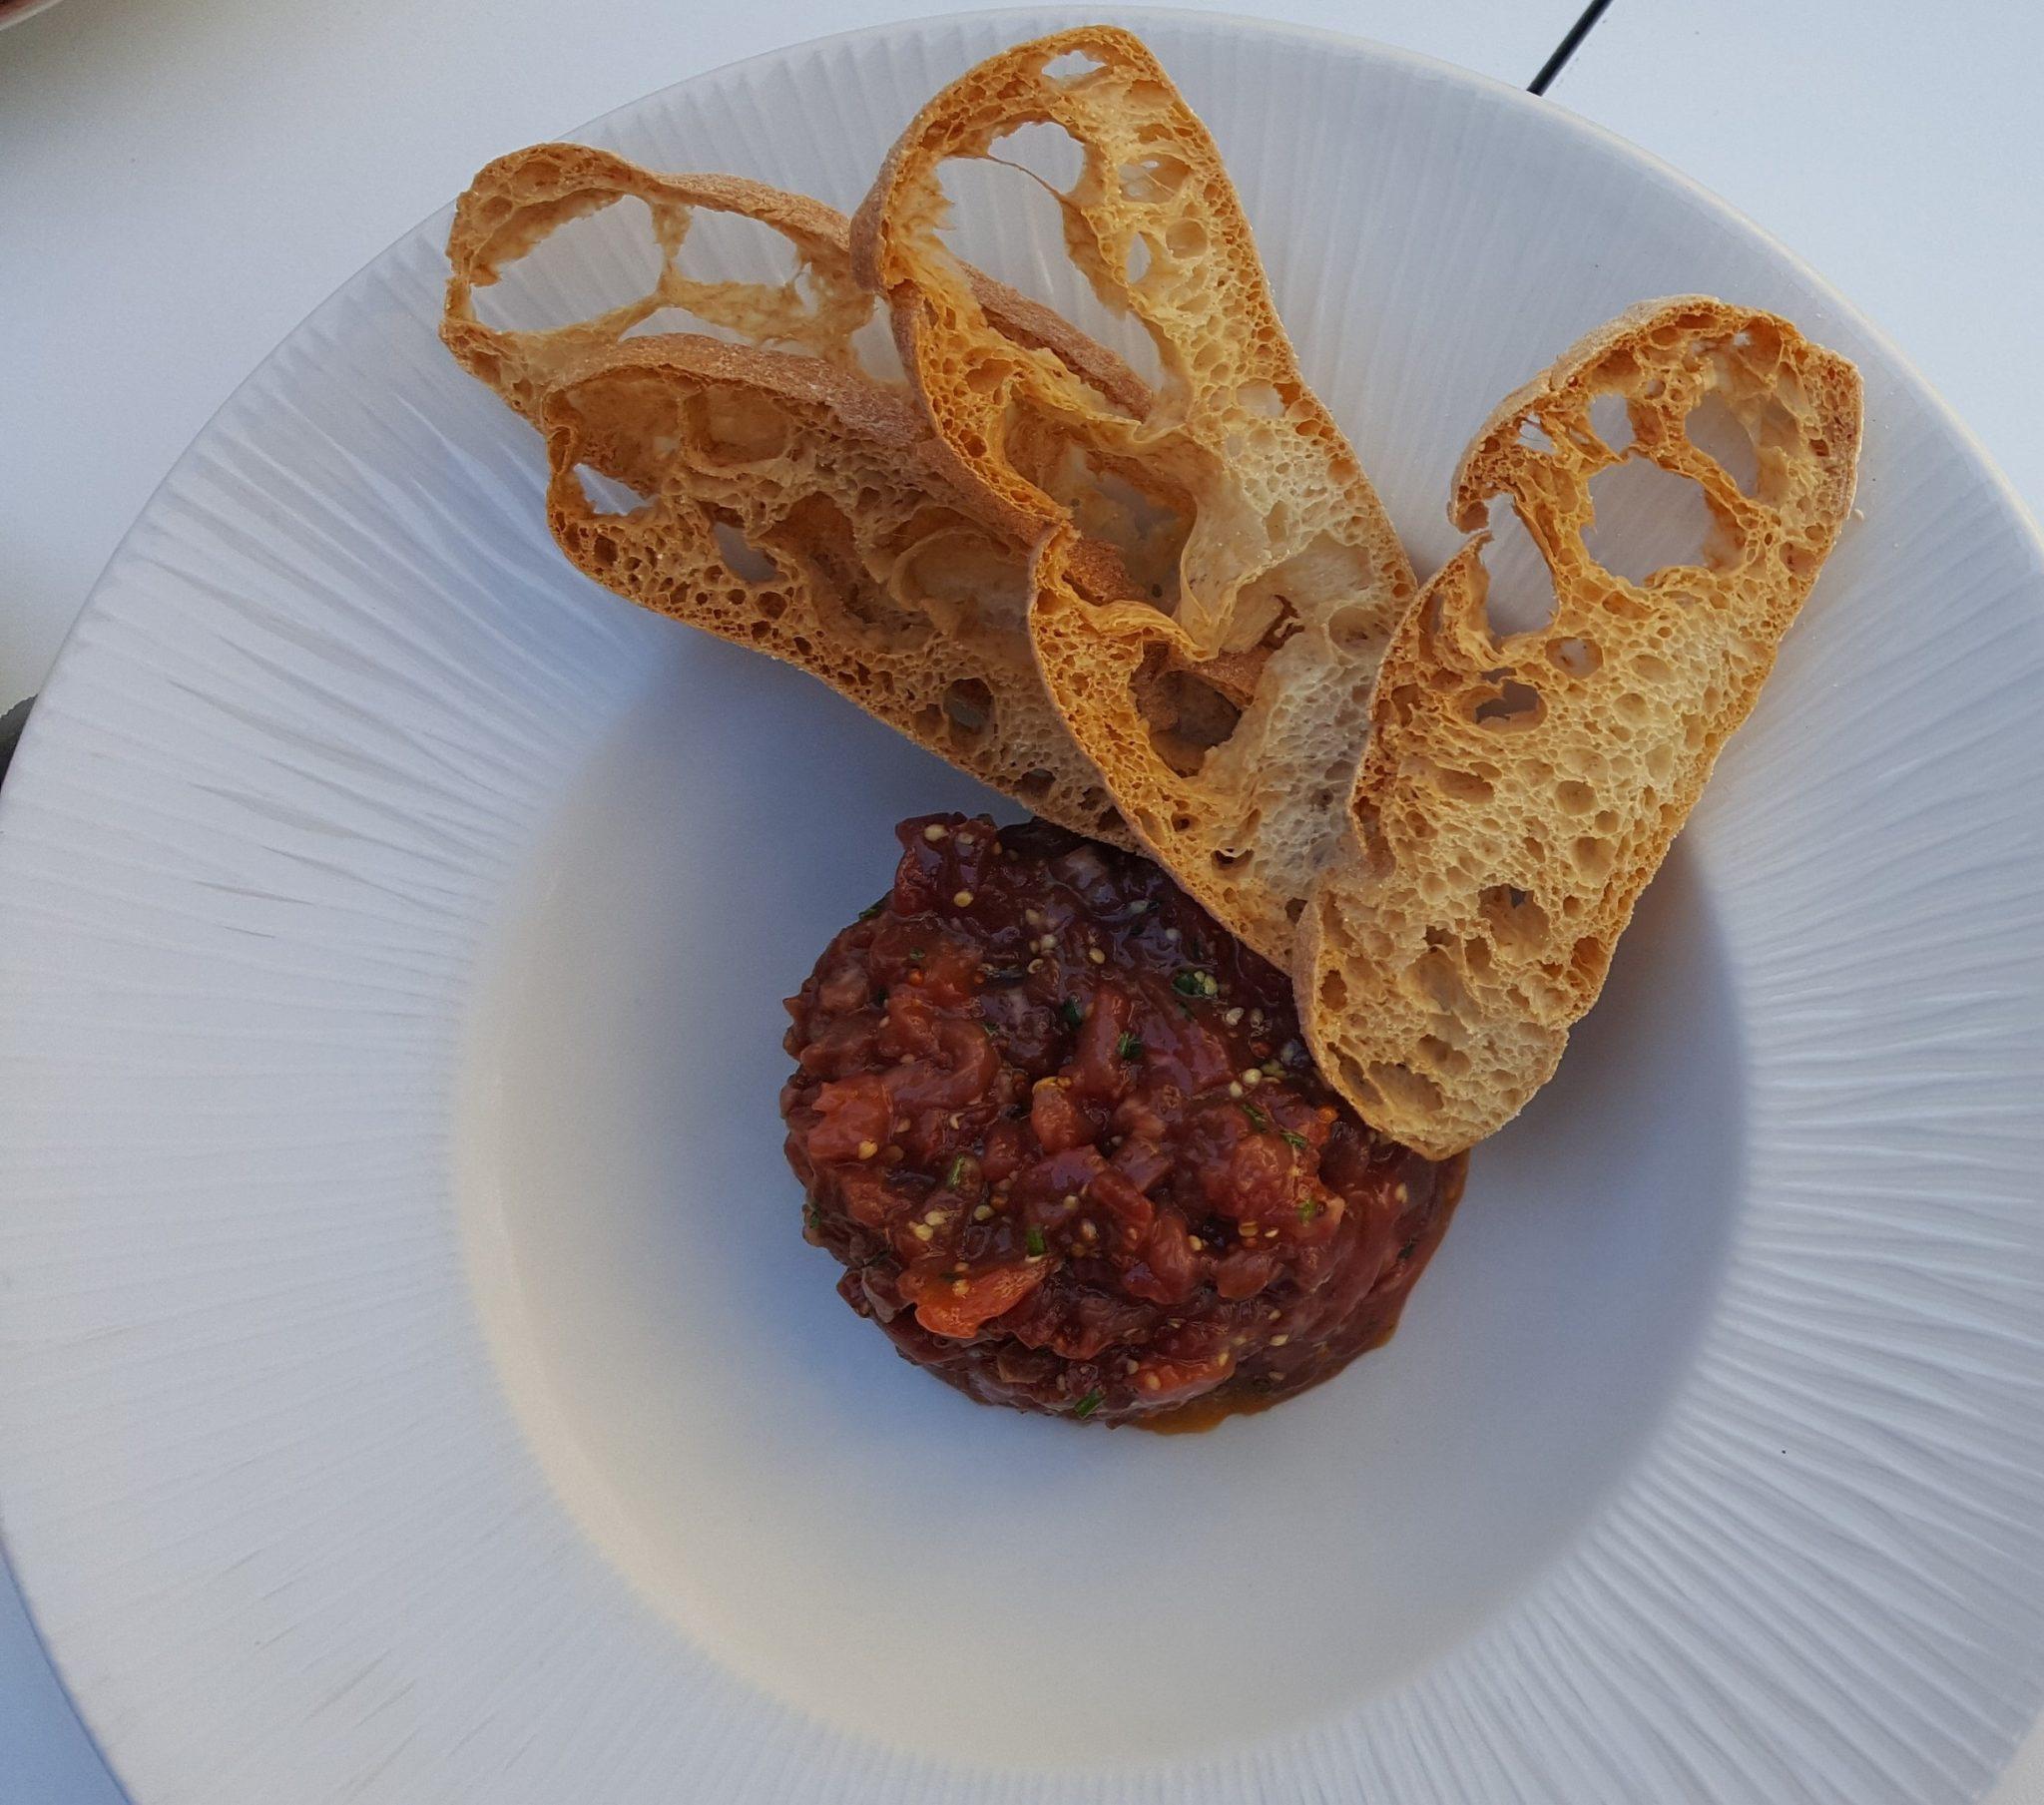 Steak Tartar tapas 3.0